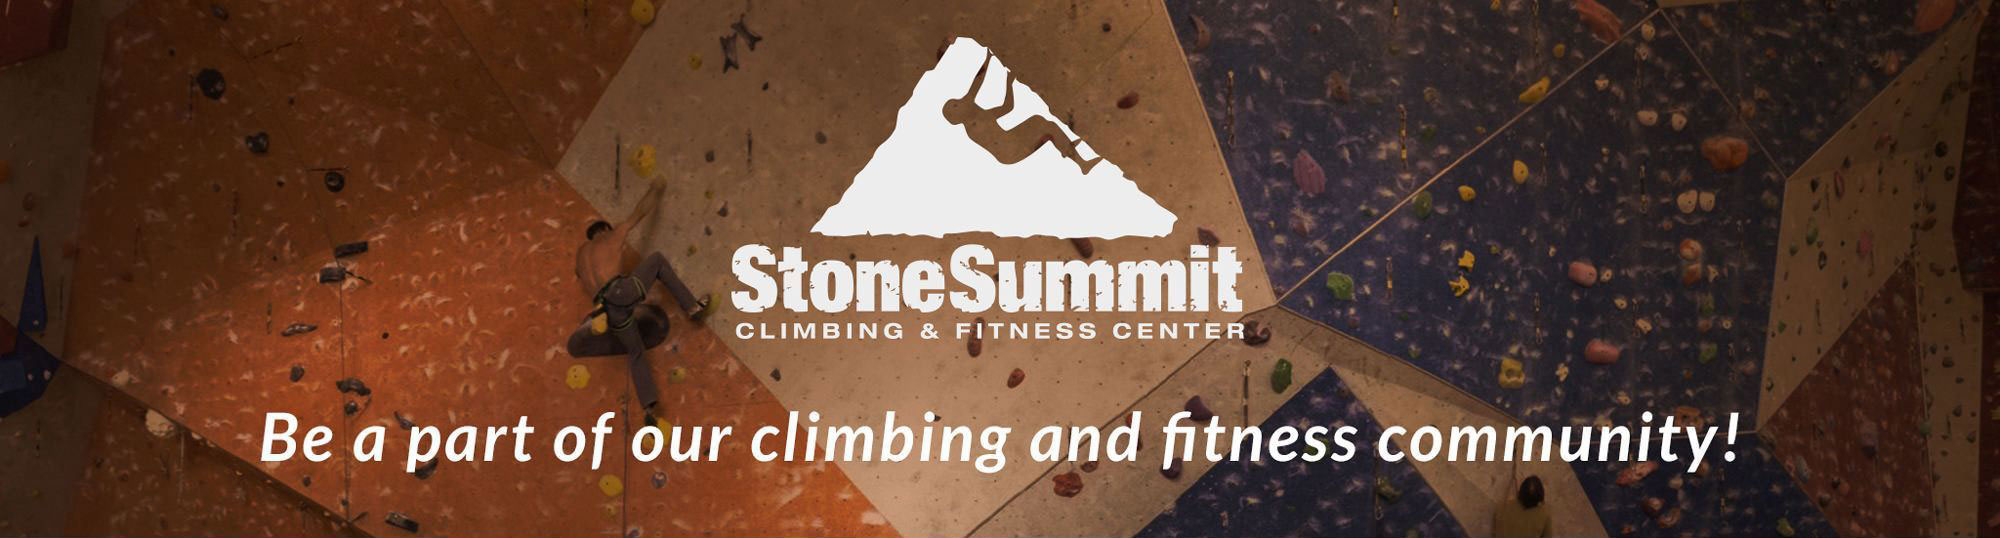 Stone Summit Climbing Gym